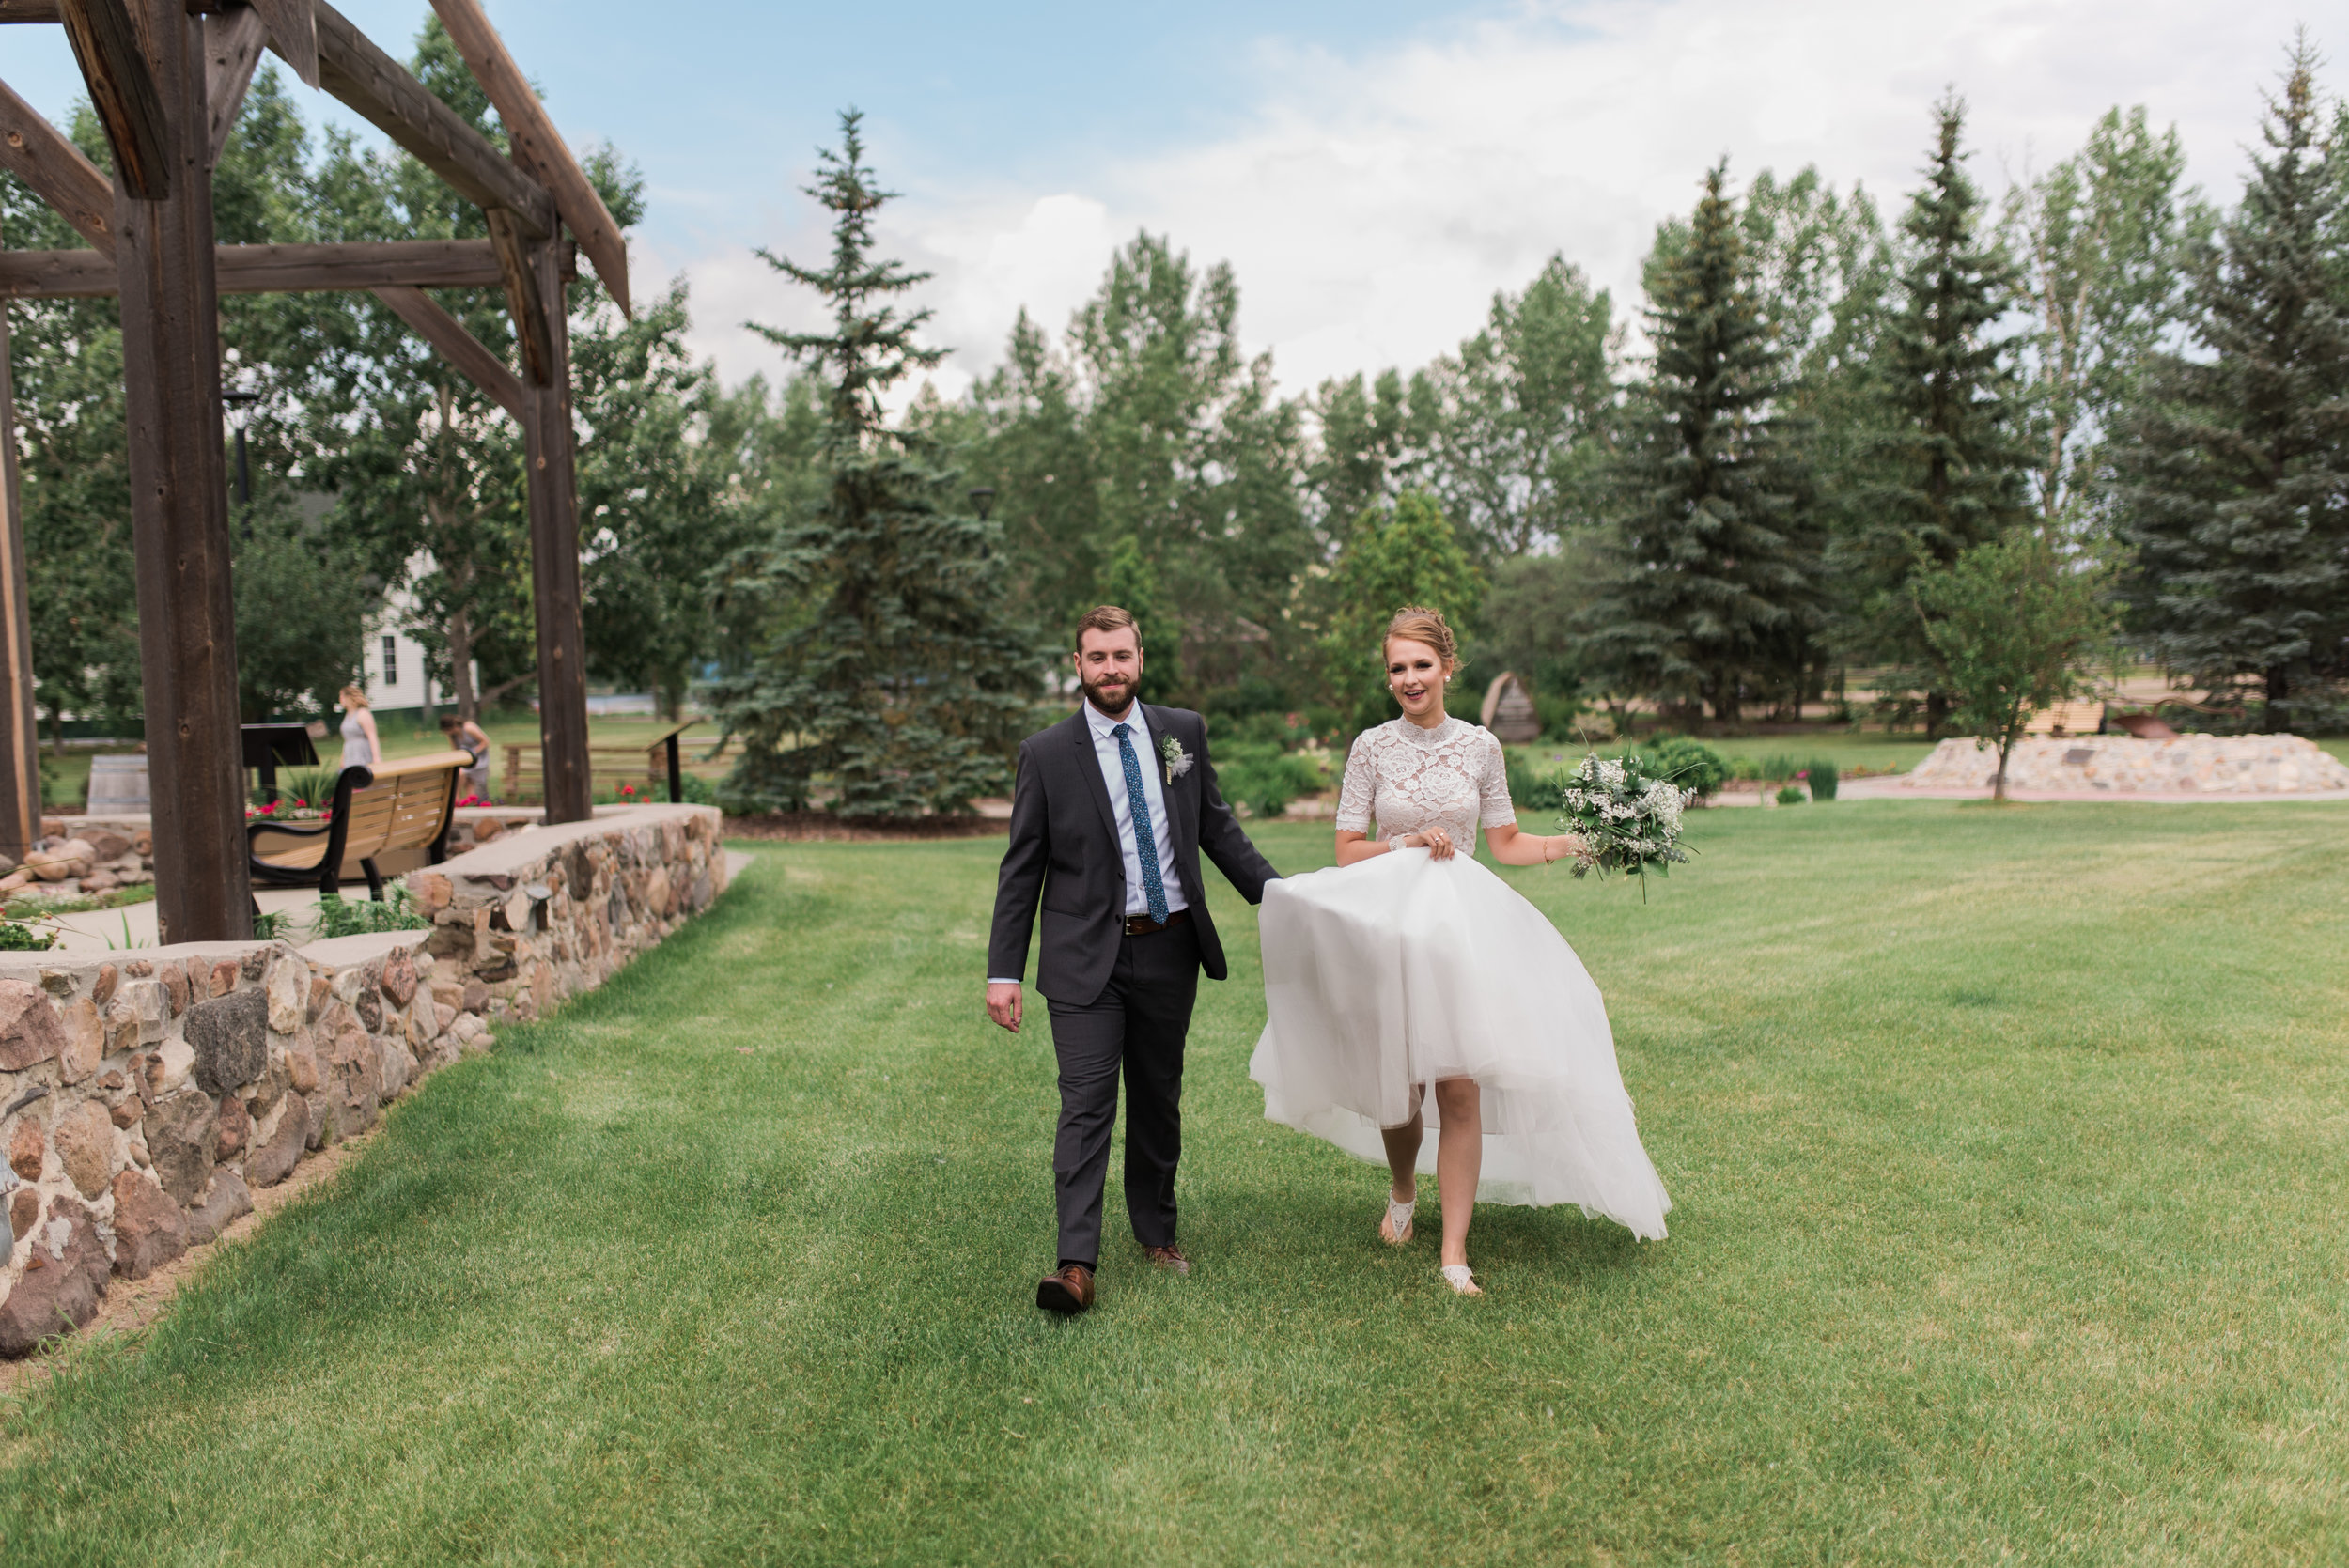 Elgert Wedding 1445.jpg